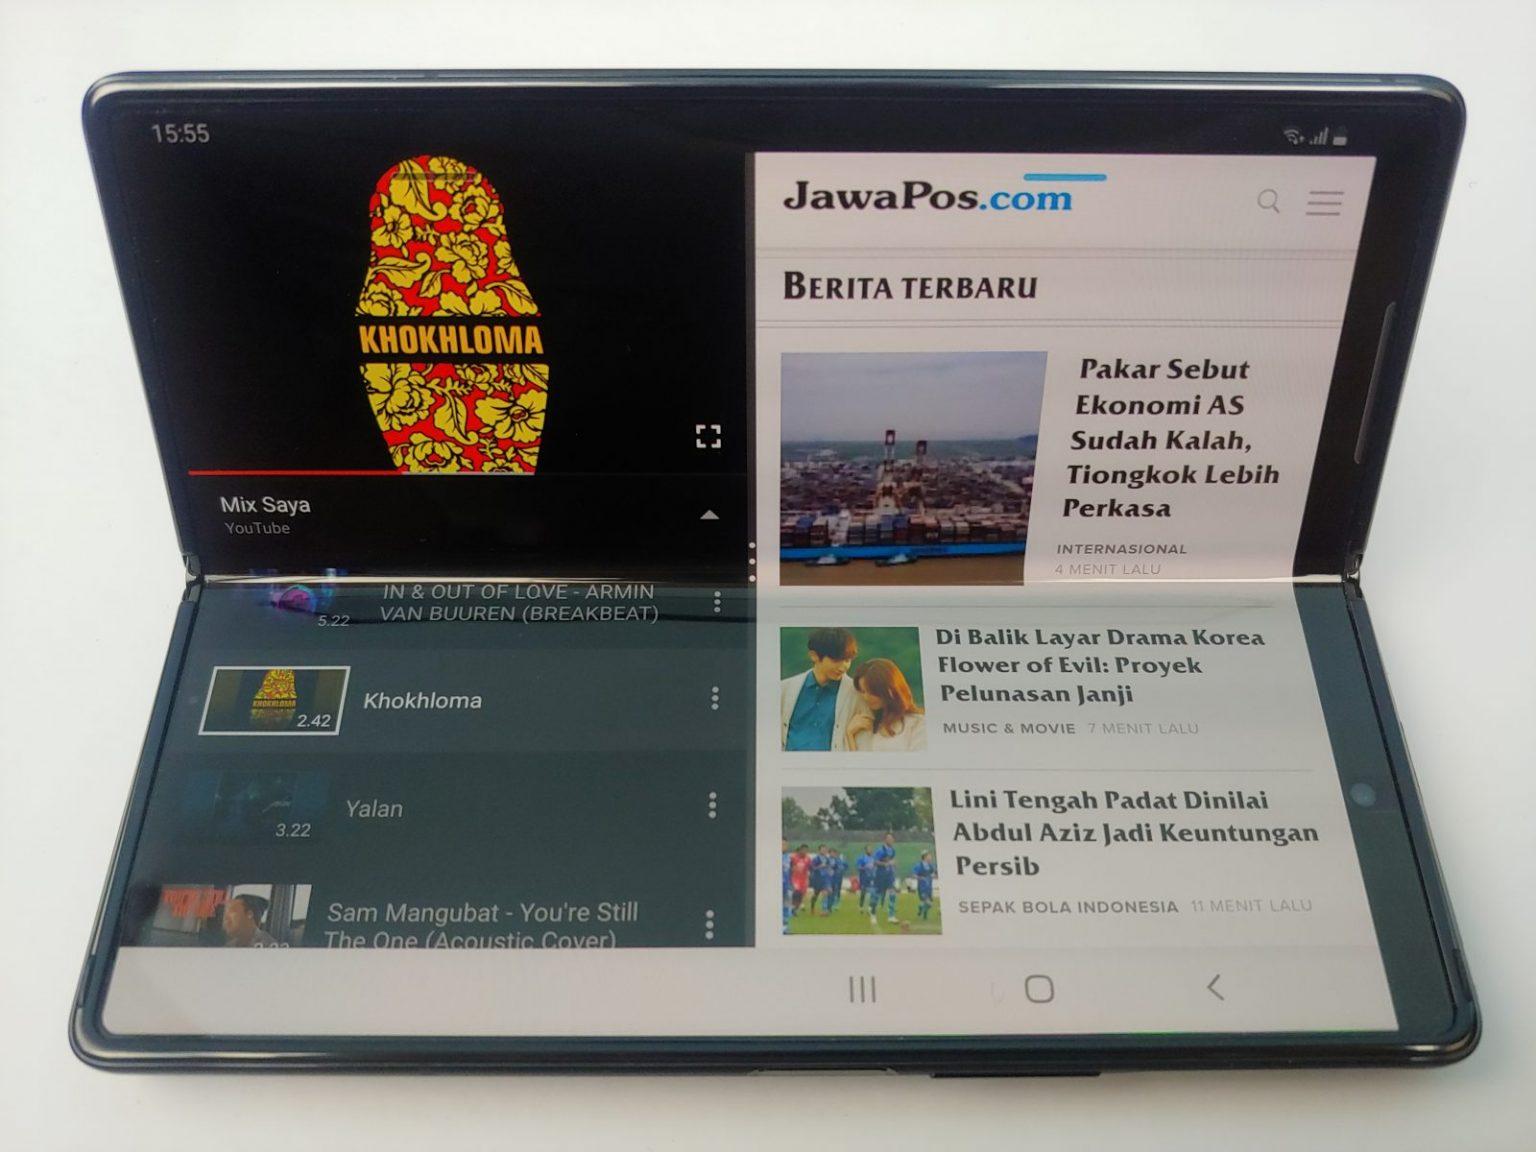 Galaxy Z Fold2 Seharga Rp33 Juta, Ini Keunggulannya